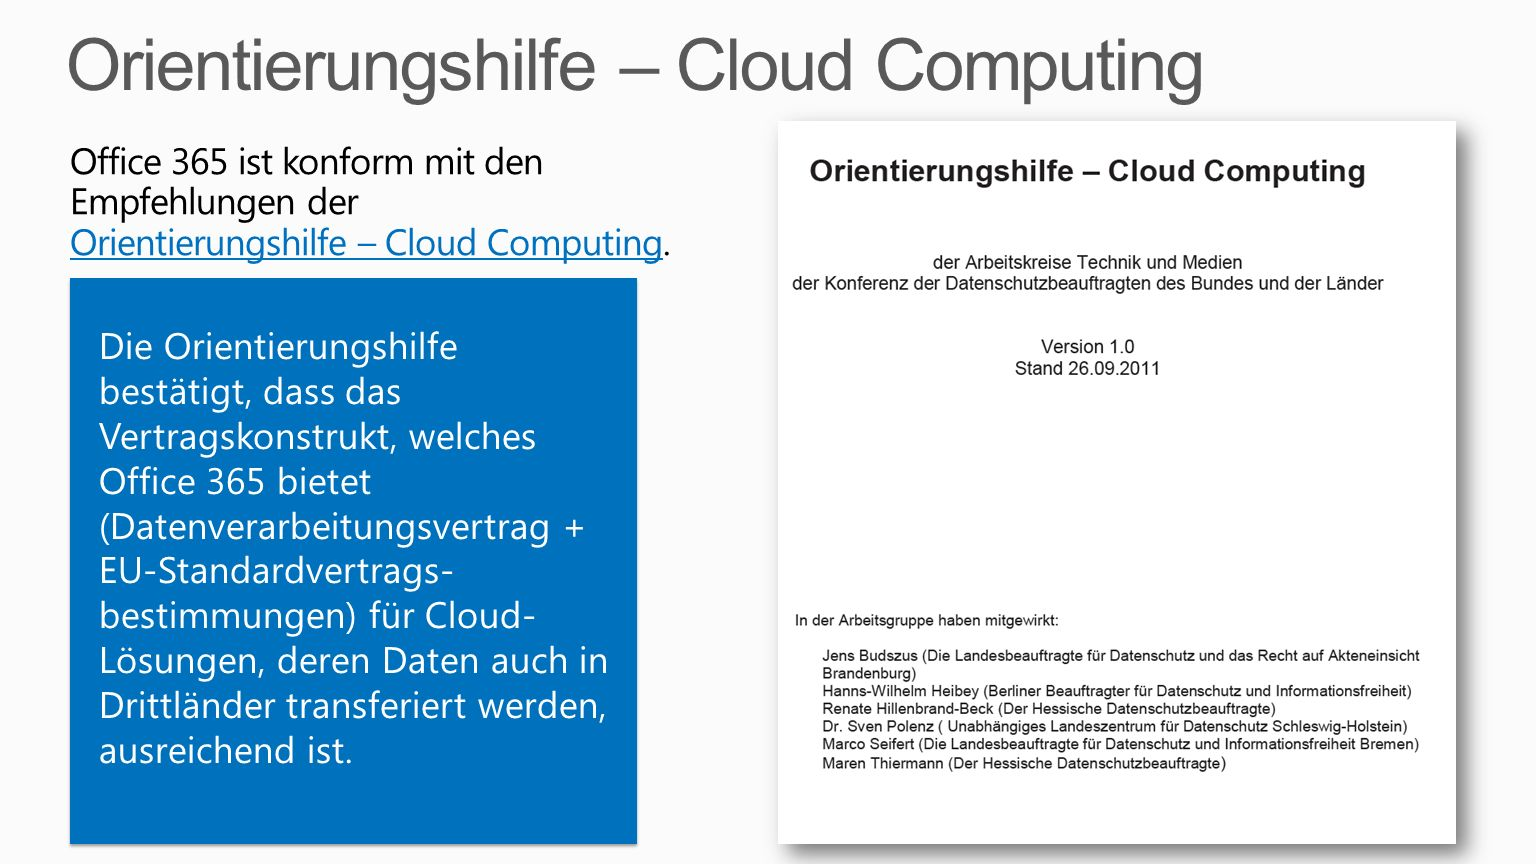 Orientierungshilfe – Cloud Computing